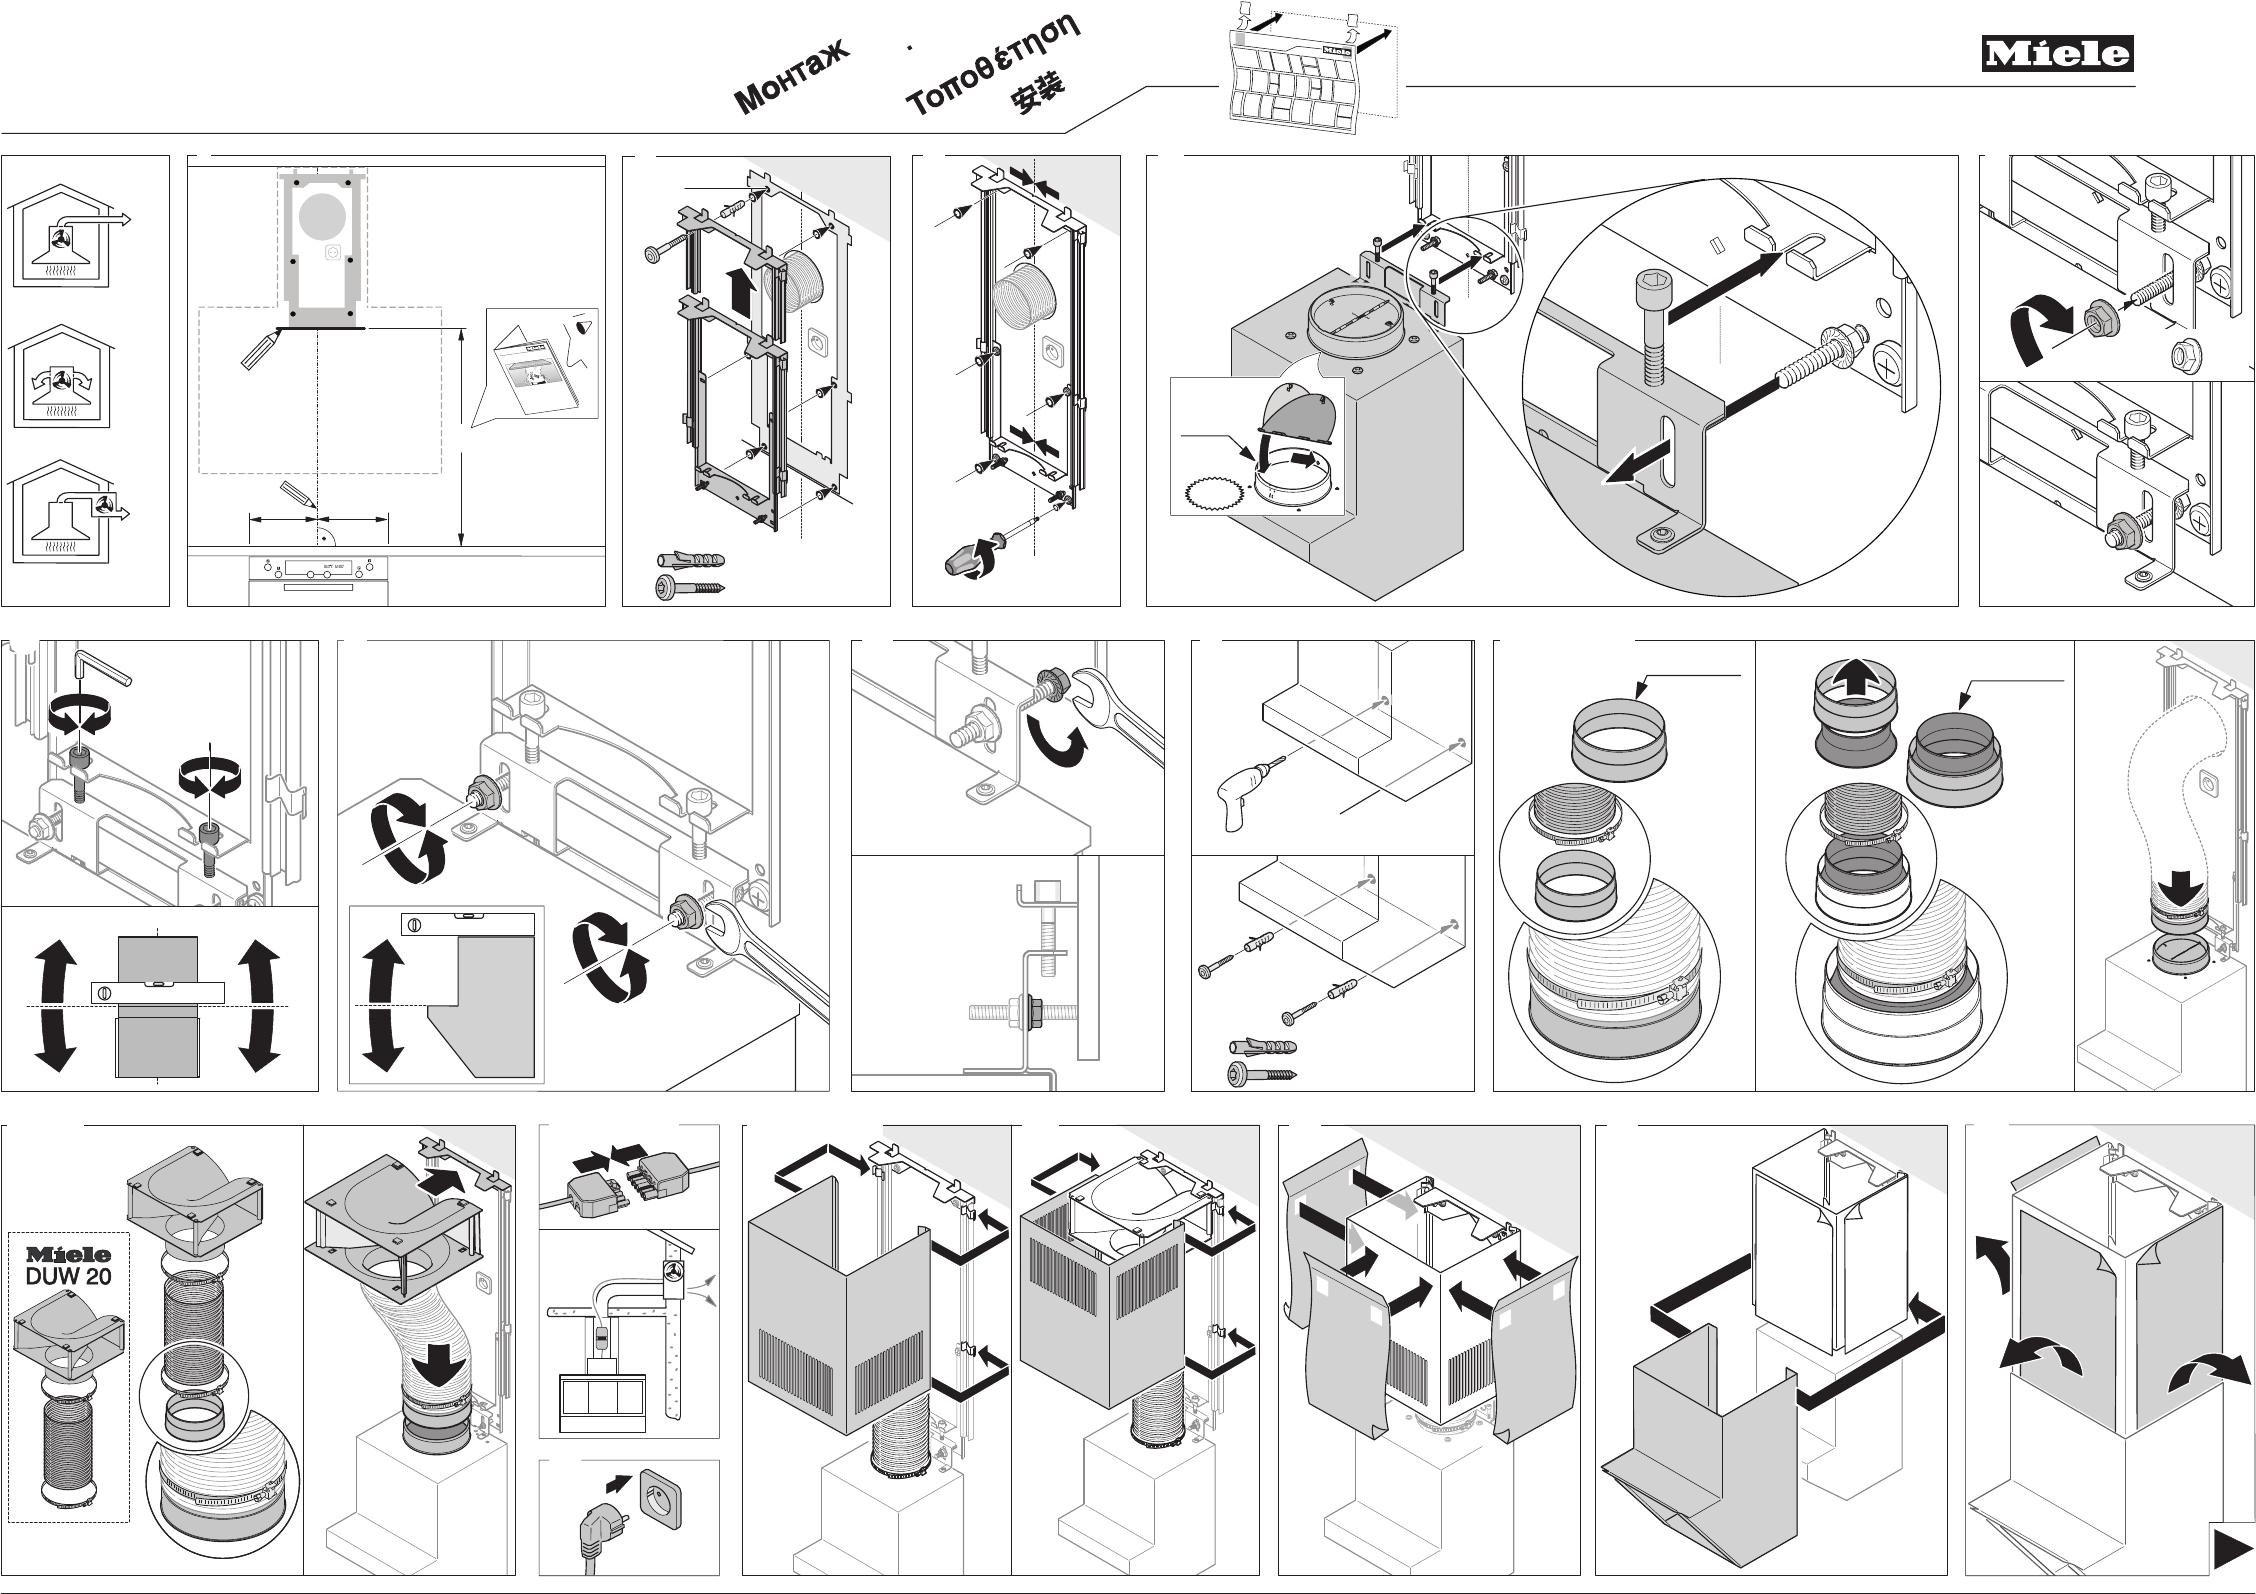 handleiding miele da 489 4 pagina 1 van 2 deutsch. Black Bedroom Furniture Sets. Home Design Ideas